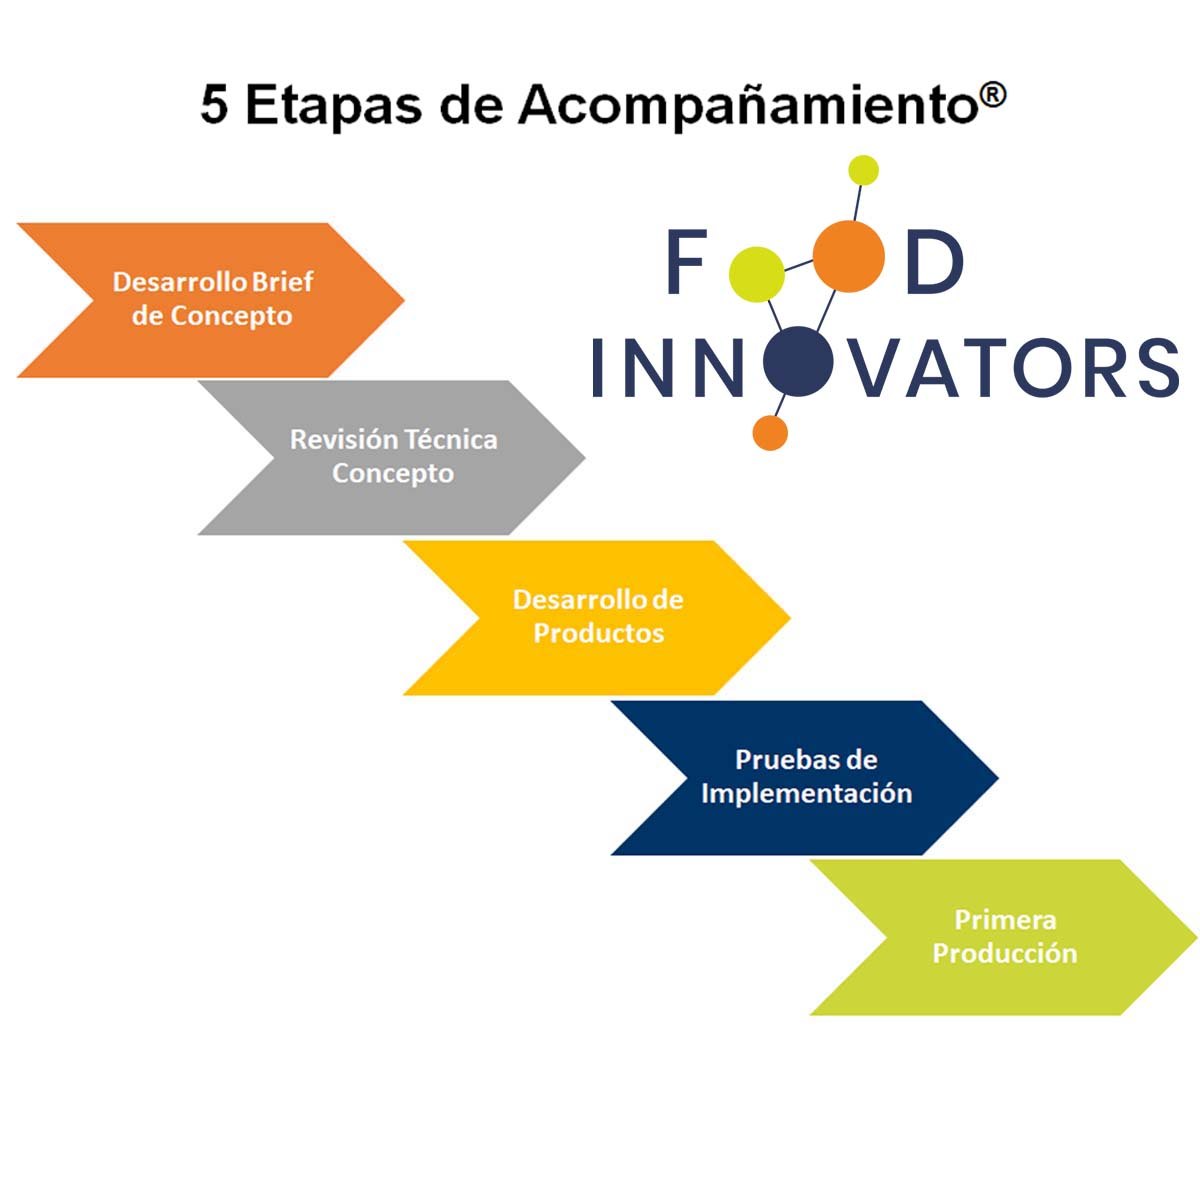 5 etapapas Food Innovators photo